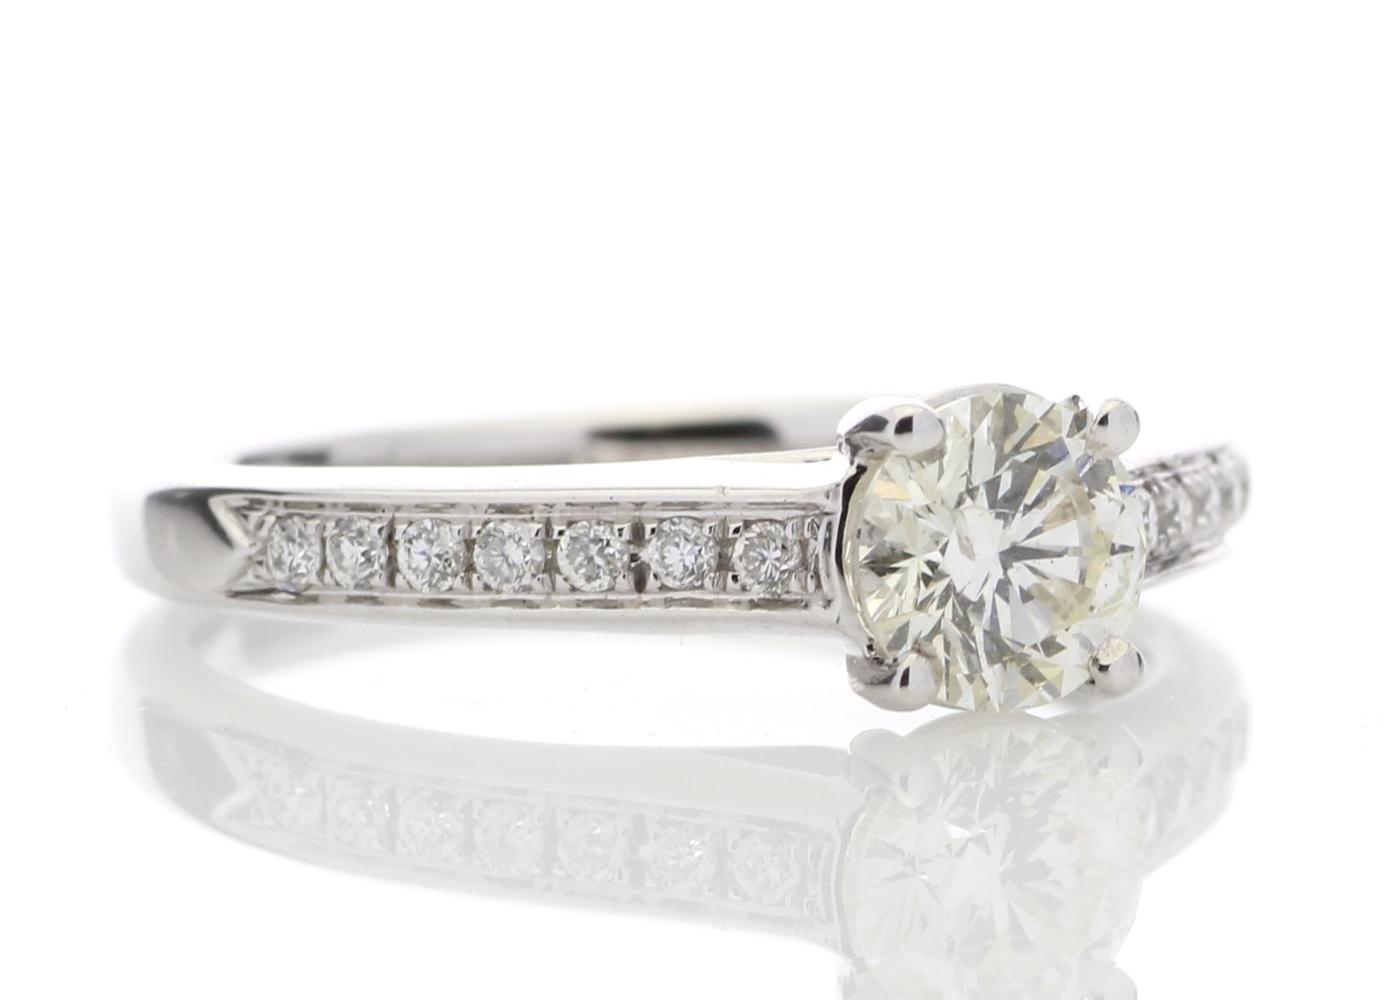 18ct White Gold Single Stone Claw Set Diamond Ring 0.73 Carats - Image 4 of 4